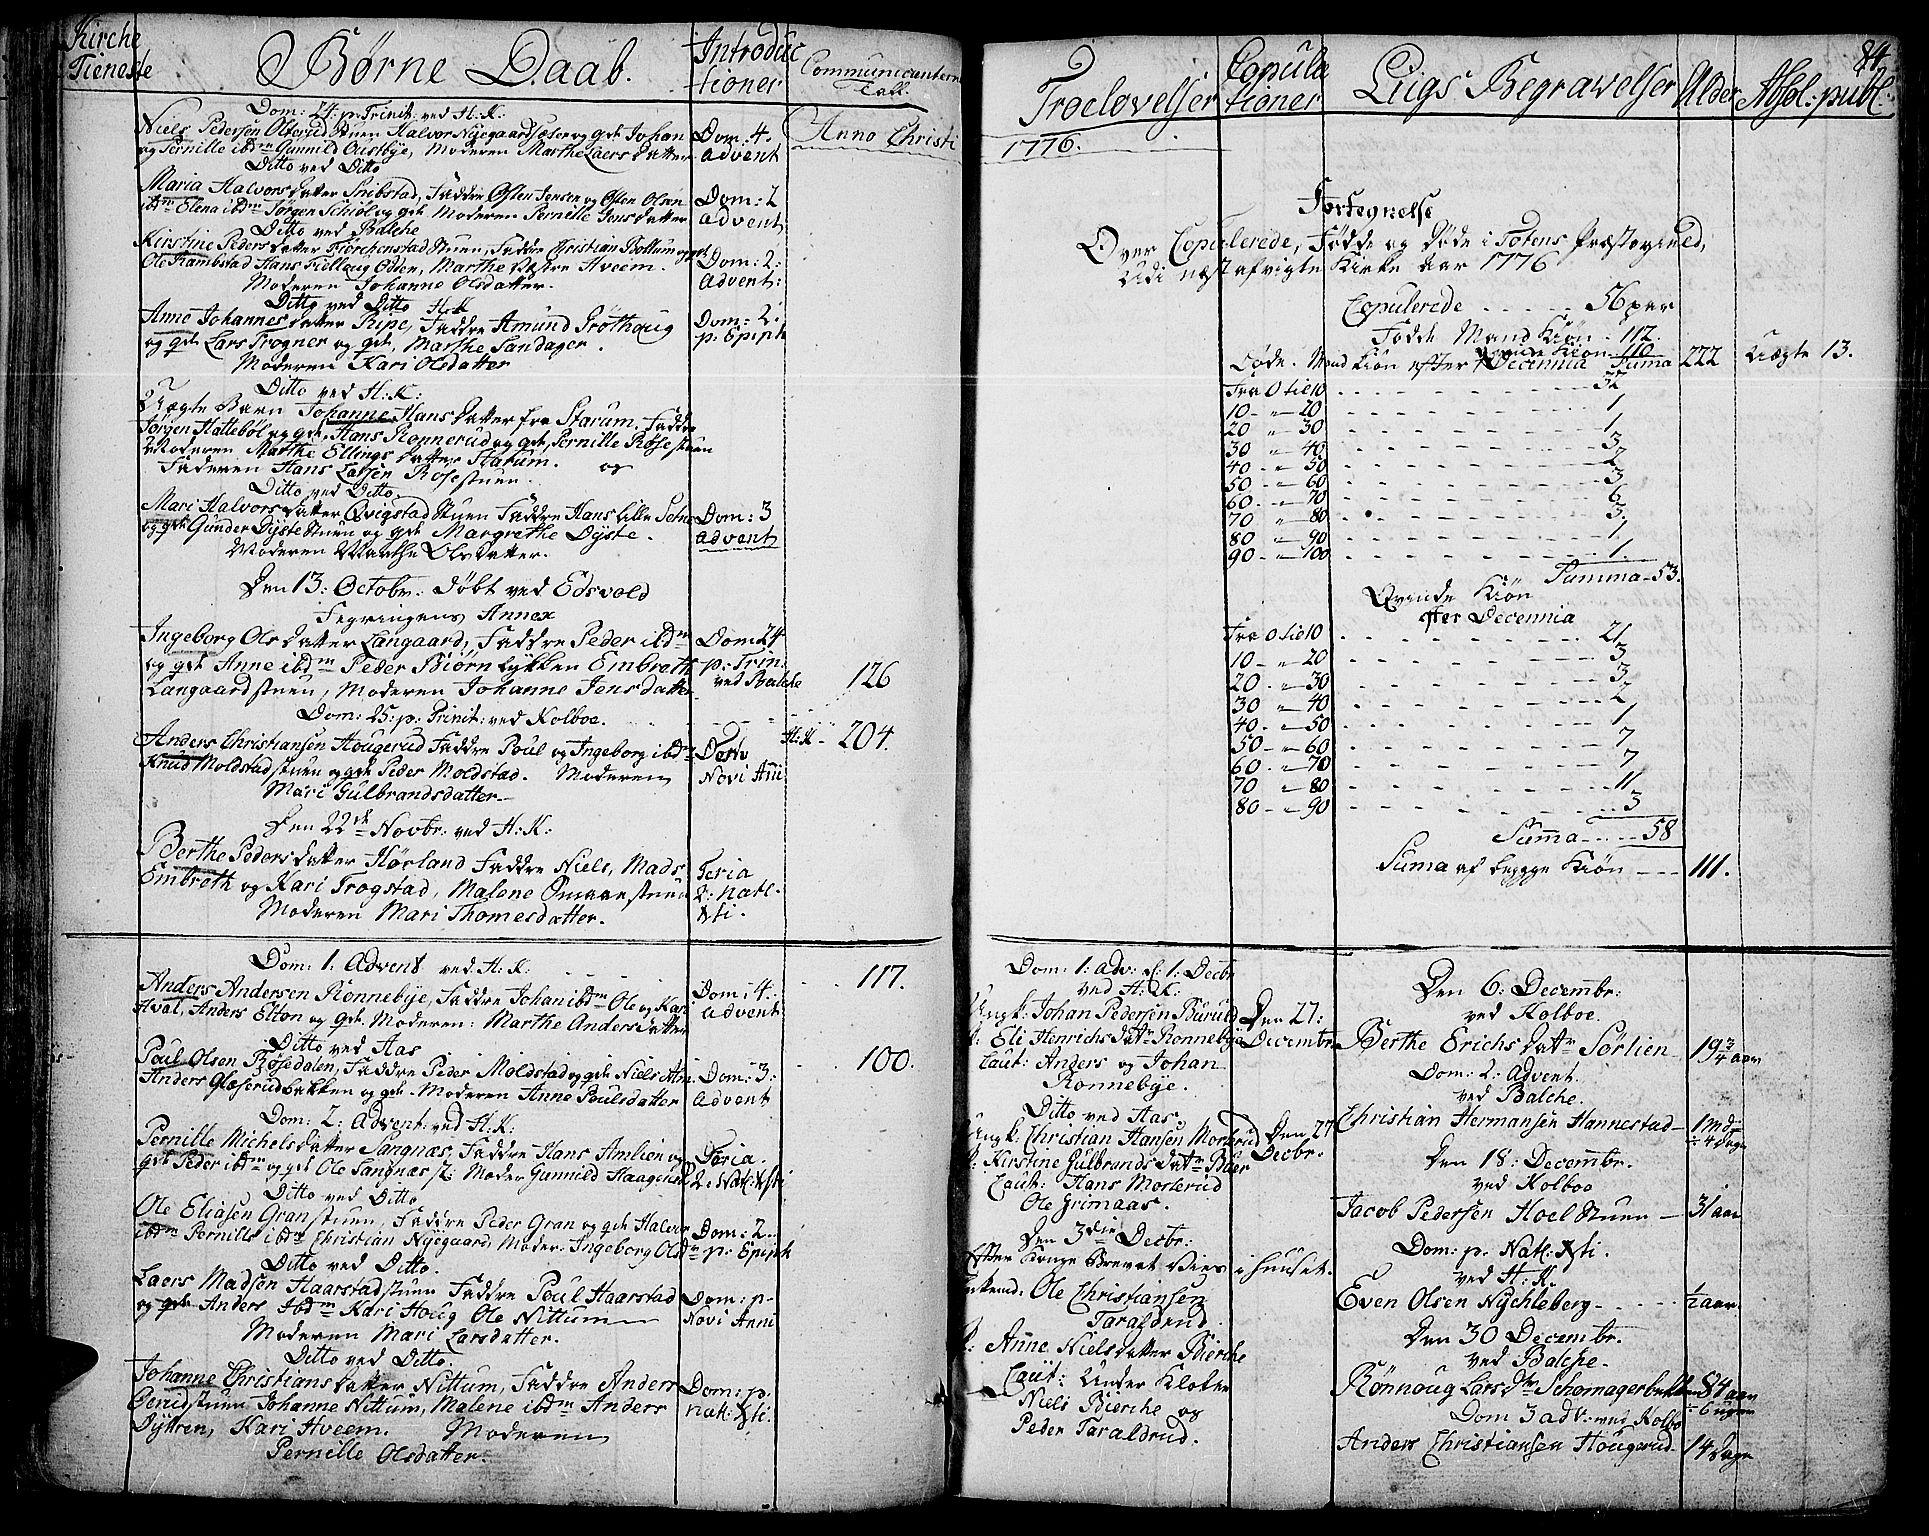 SAH, Toten prestekontor, Ministerialbok nr. 6, 1773-1793, s. 84